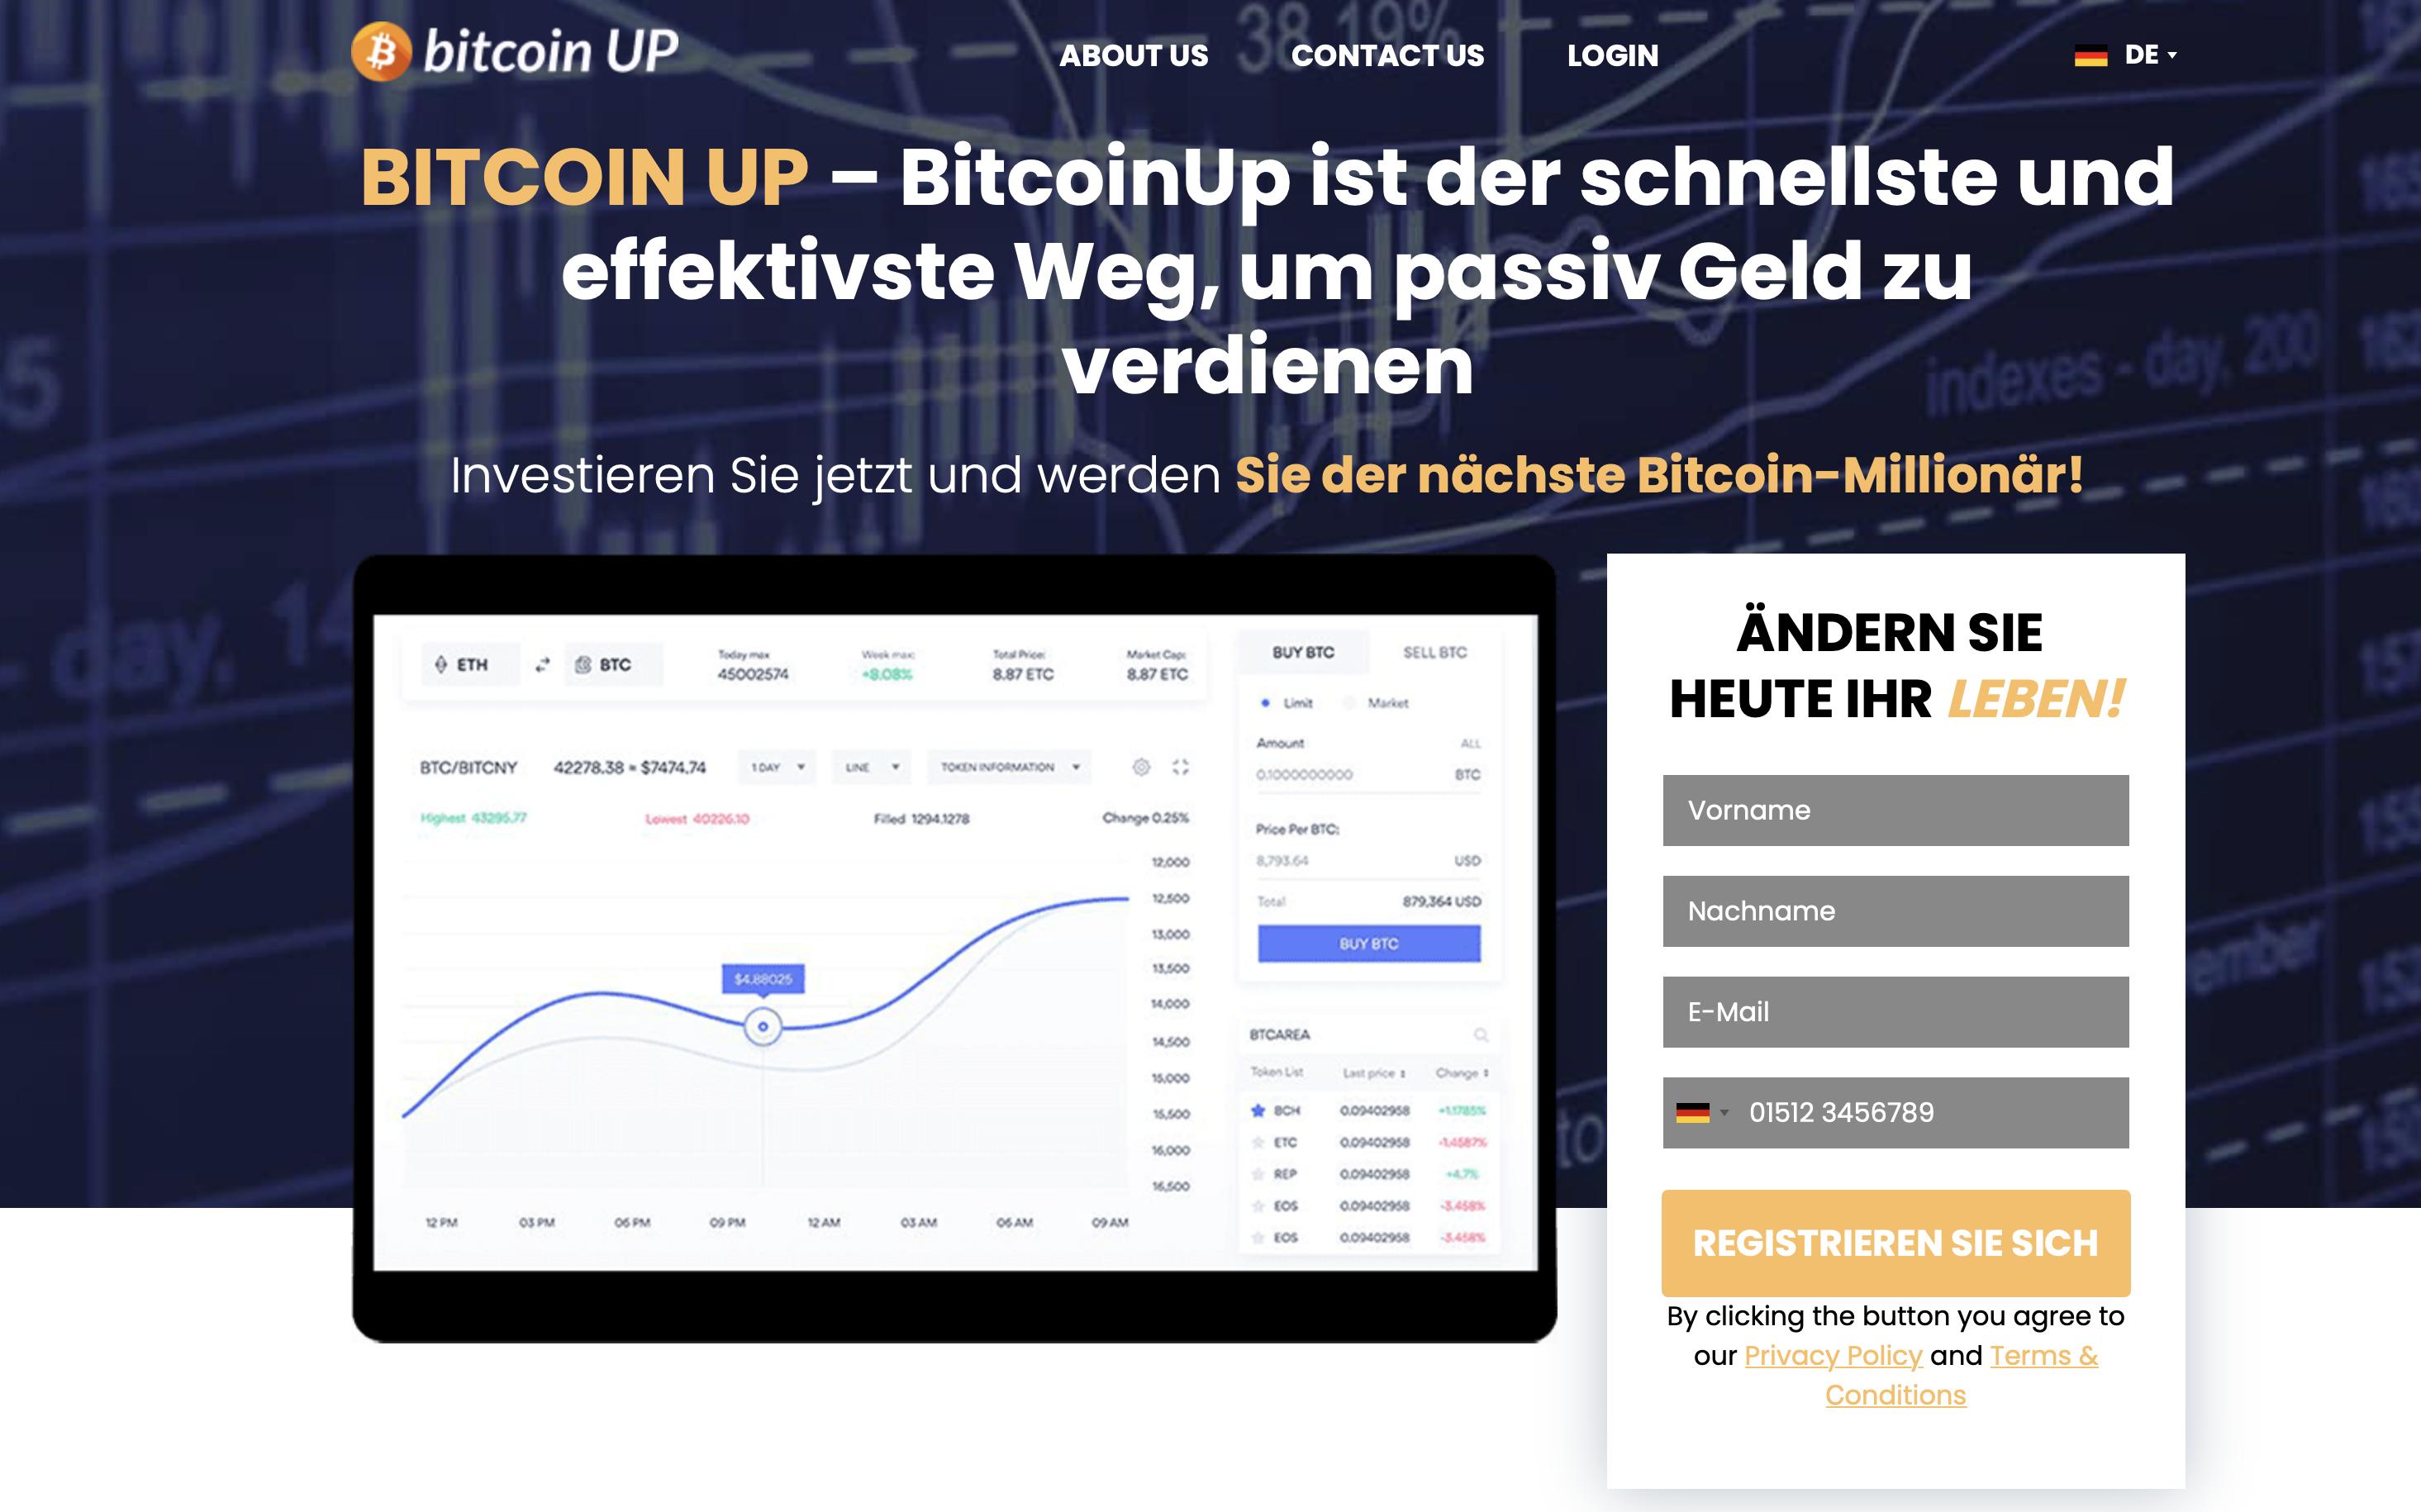 Loslegen mit Bitcoin